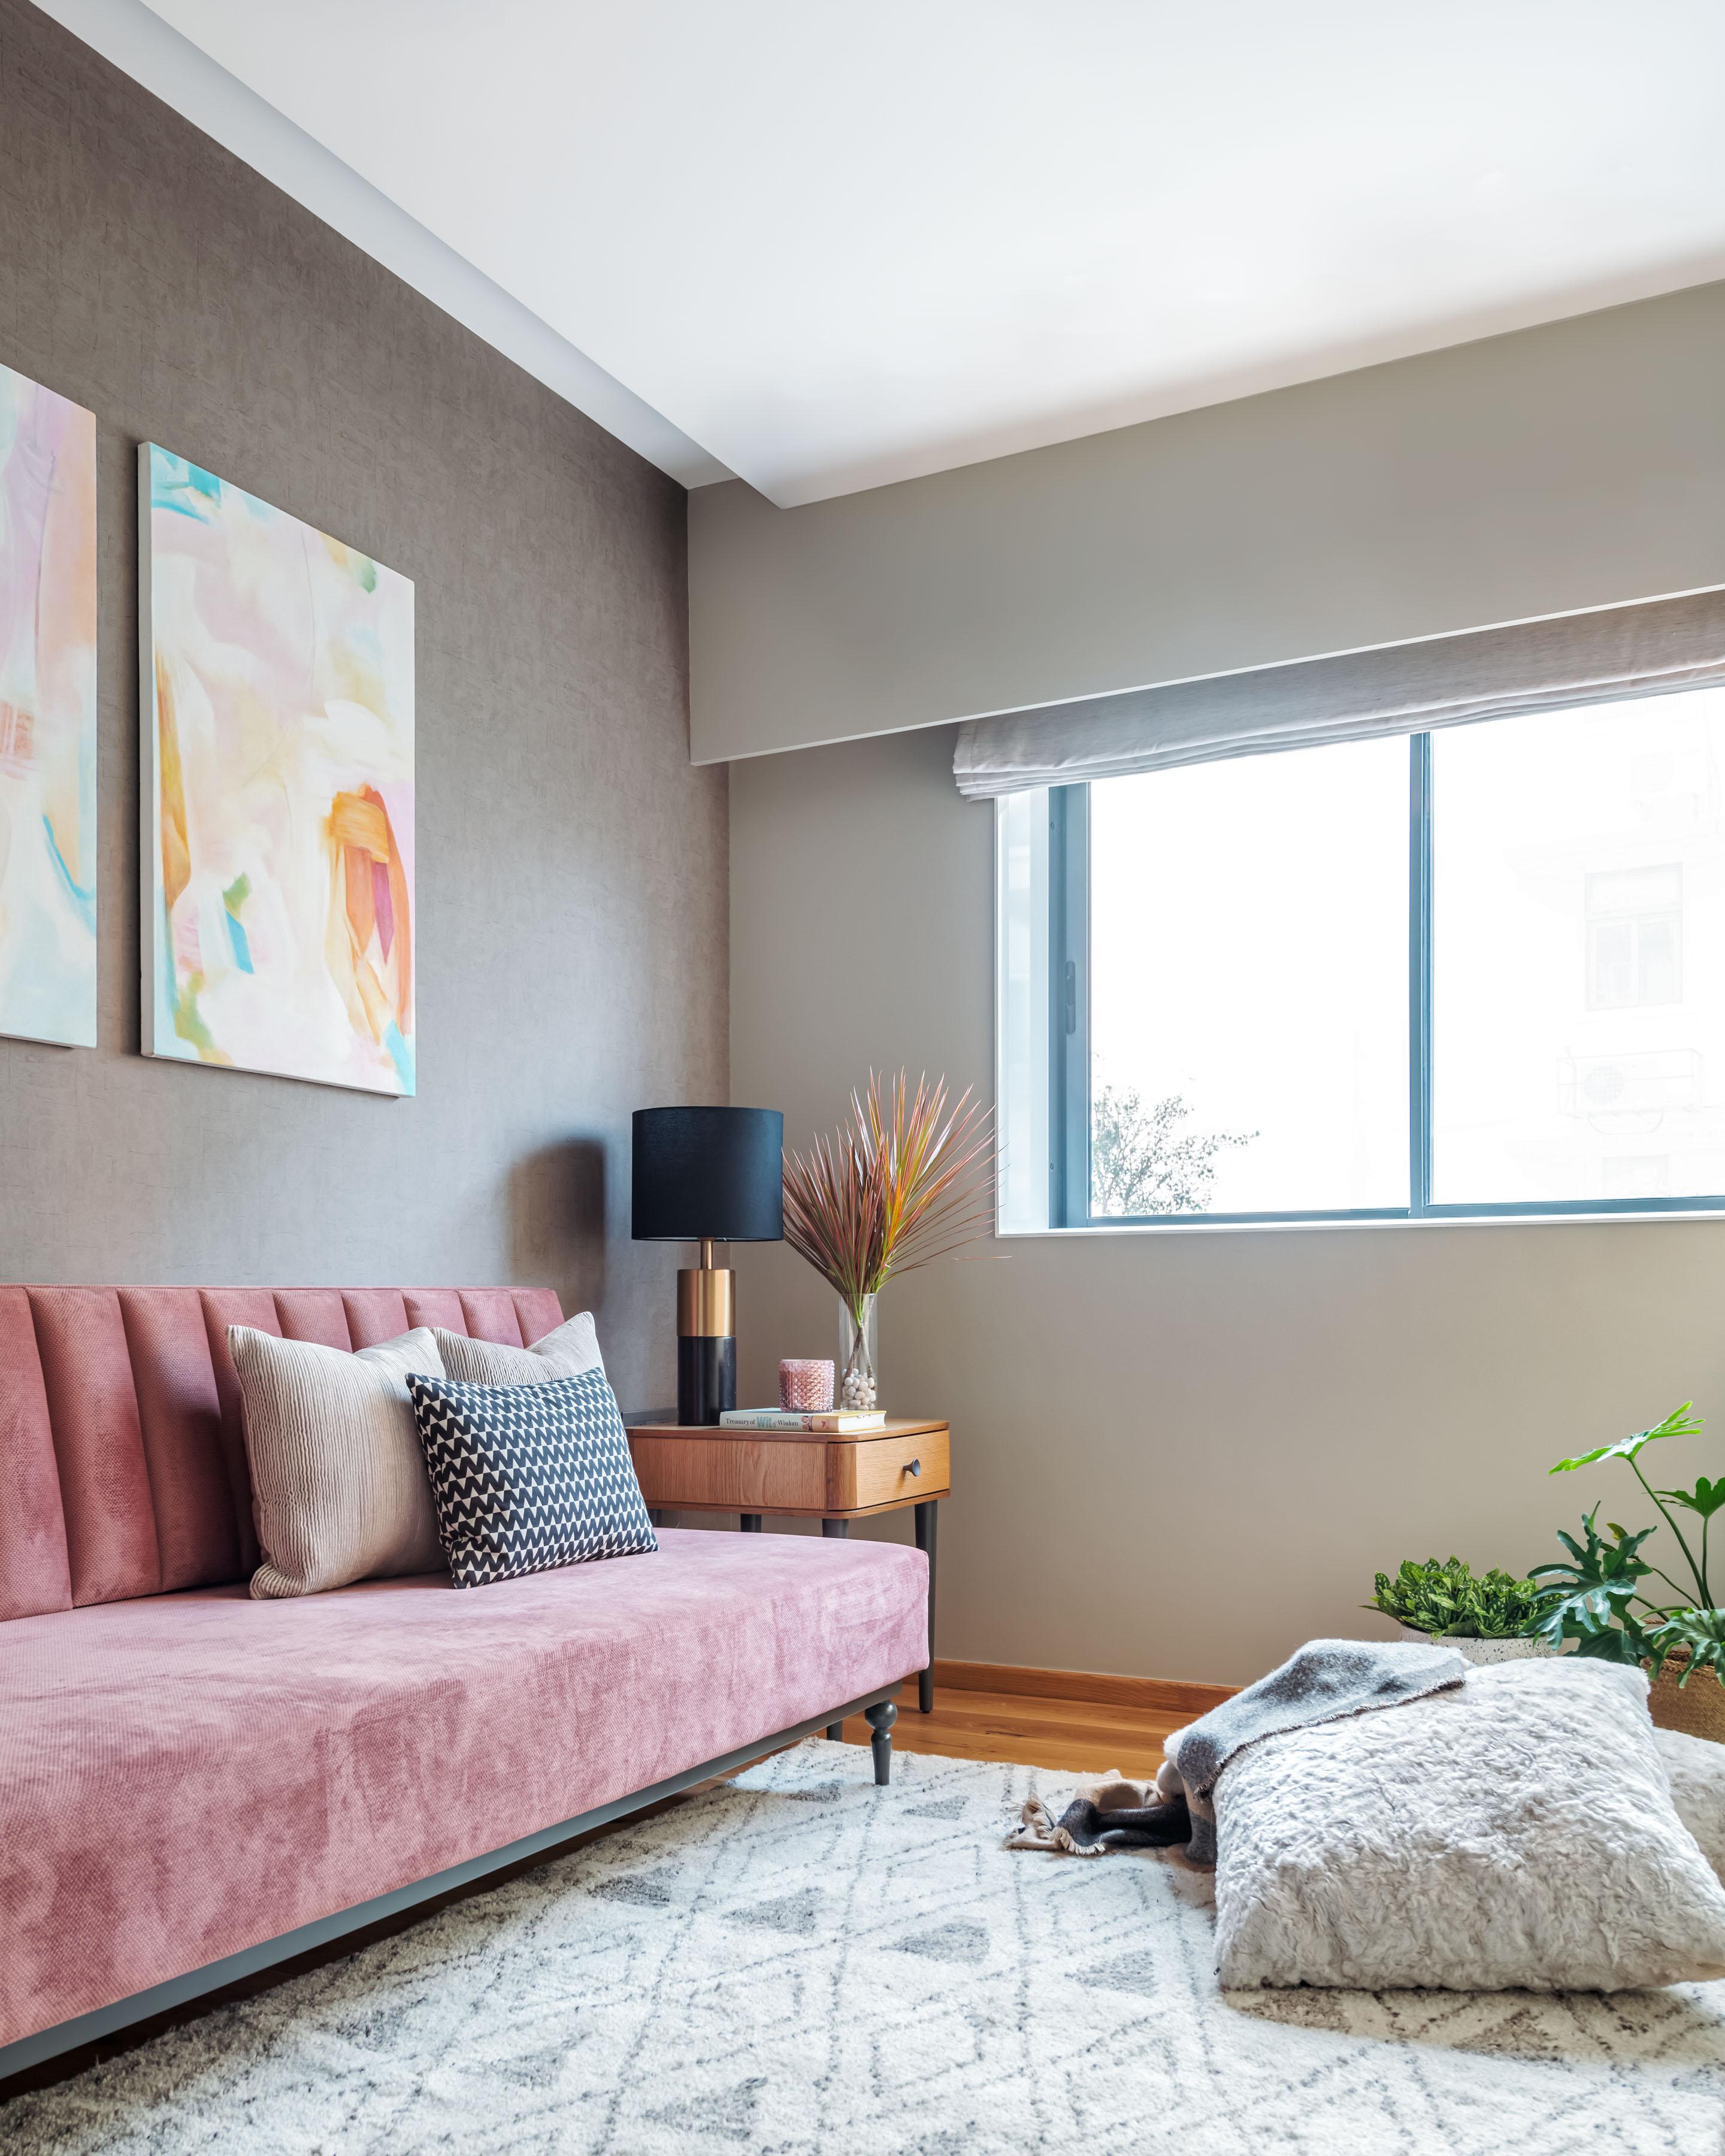 buy-handmade-rug-for-home